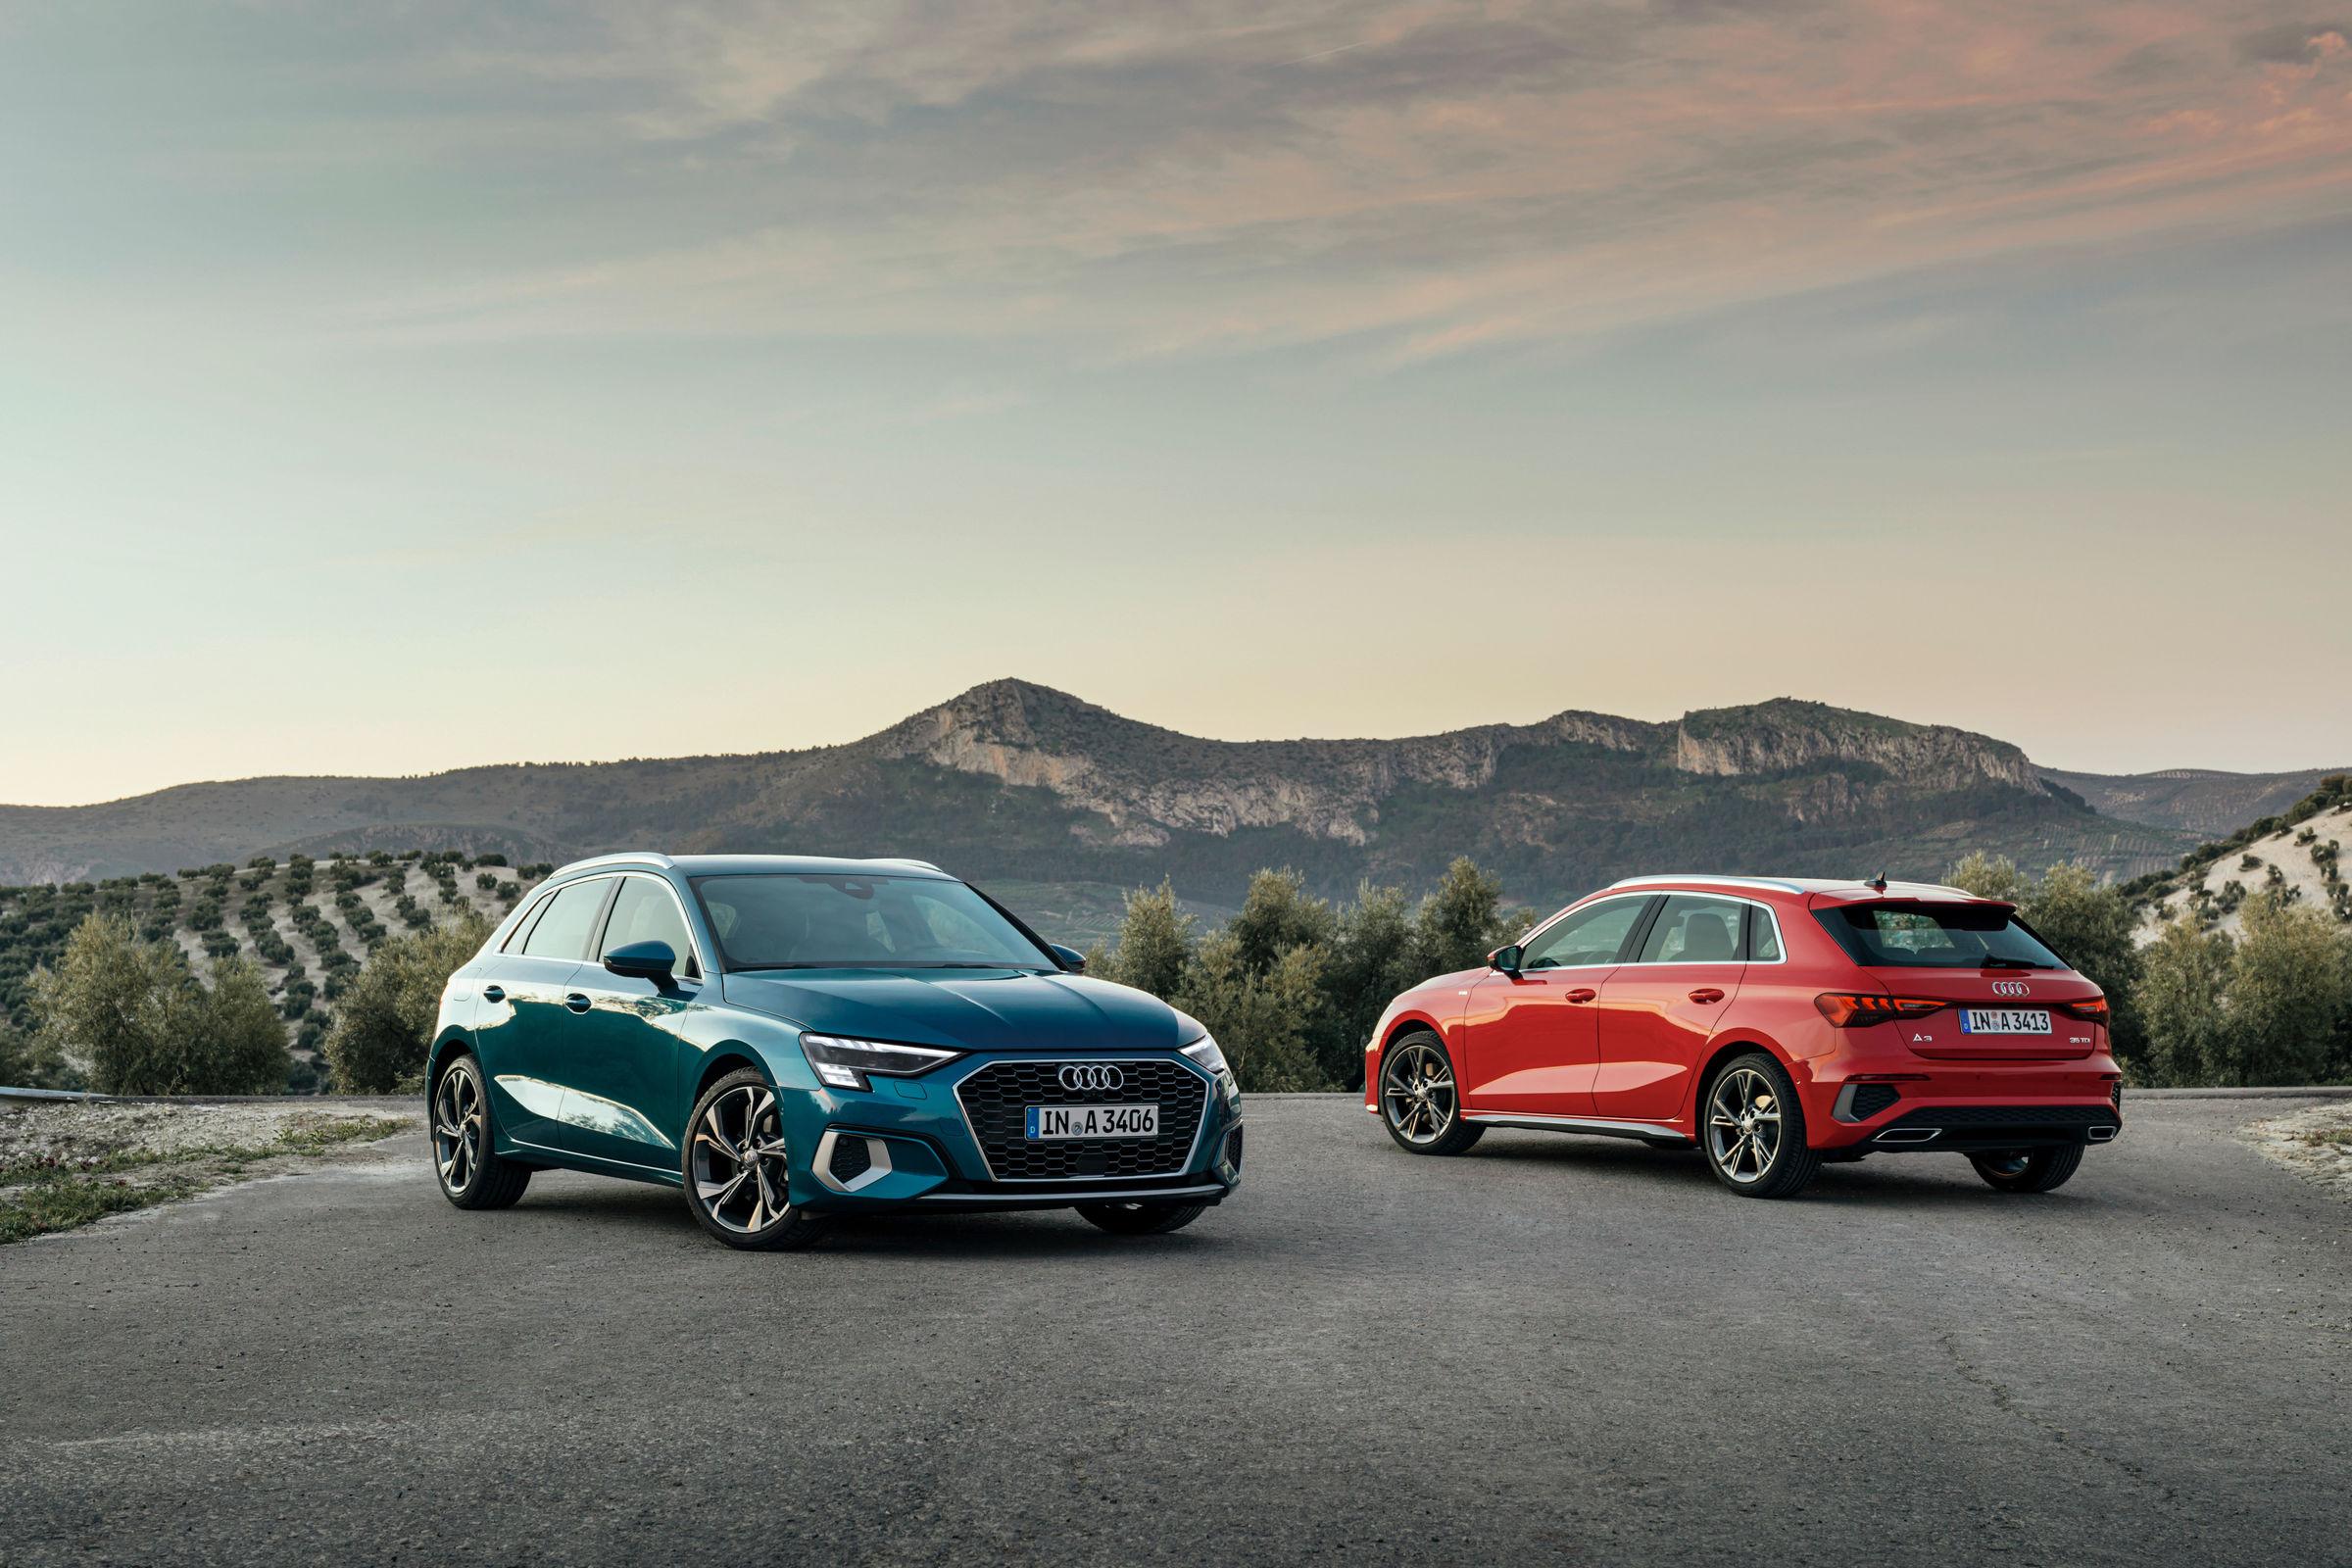 Success model 4.0: the new Audi A3 Sportback - Image 8